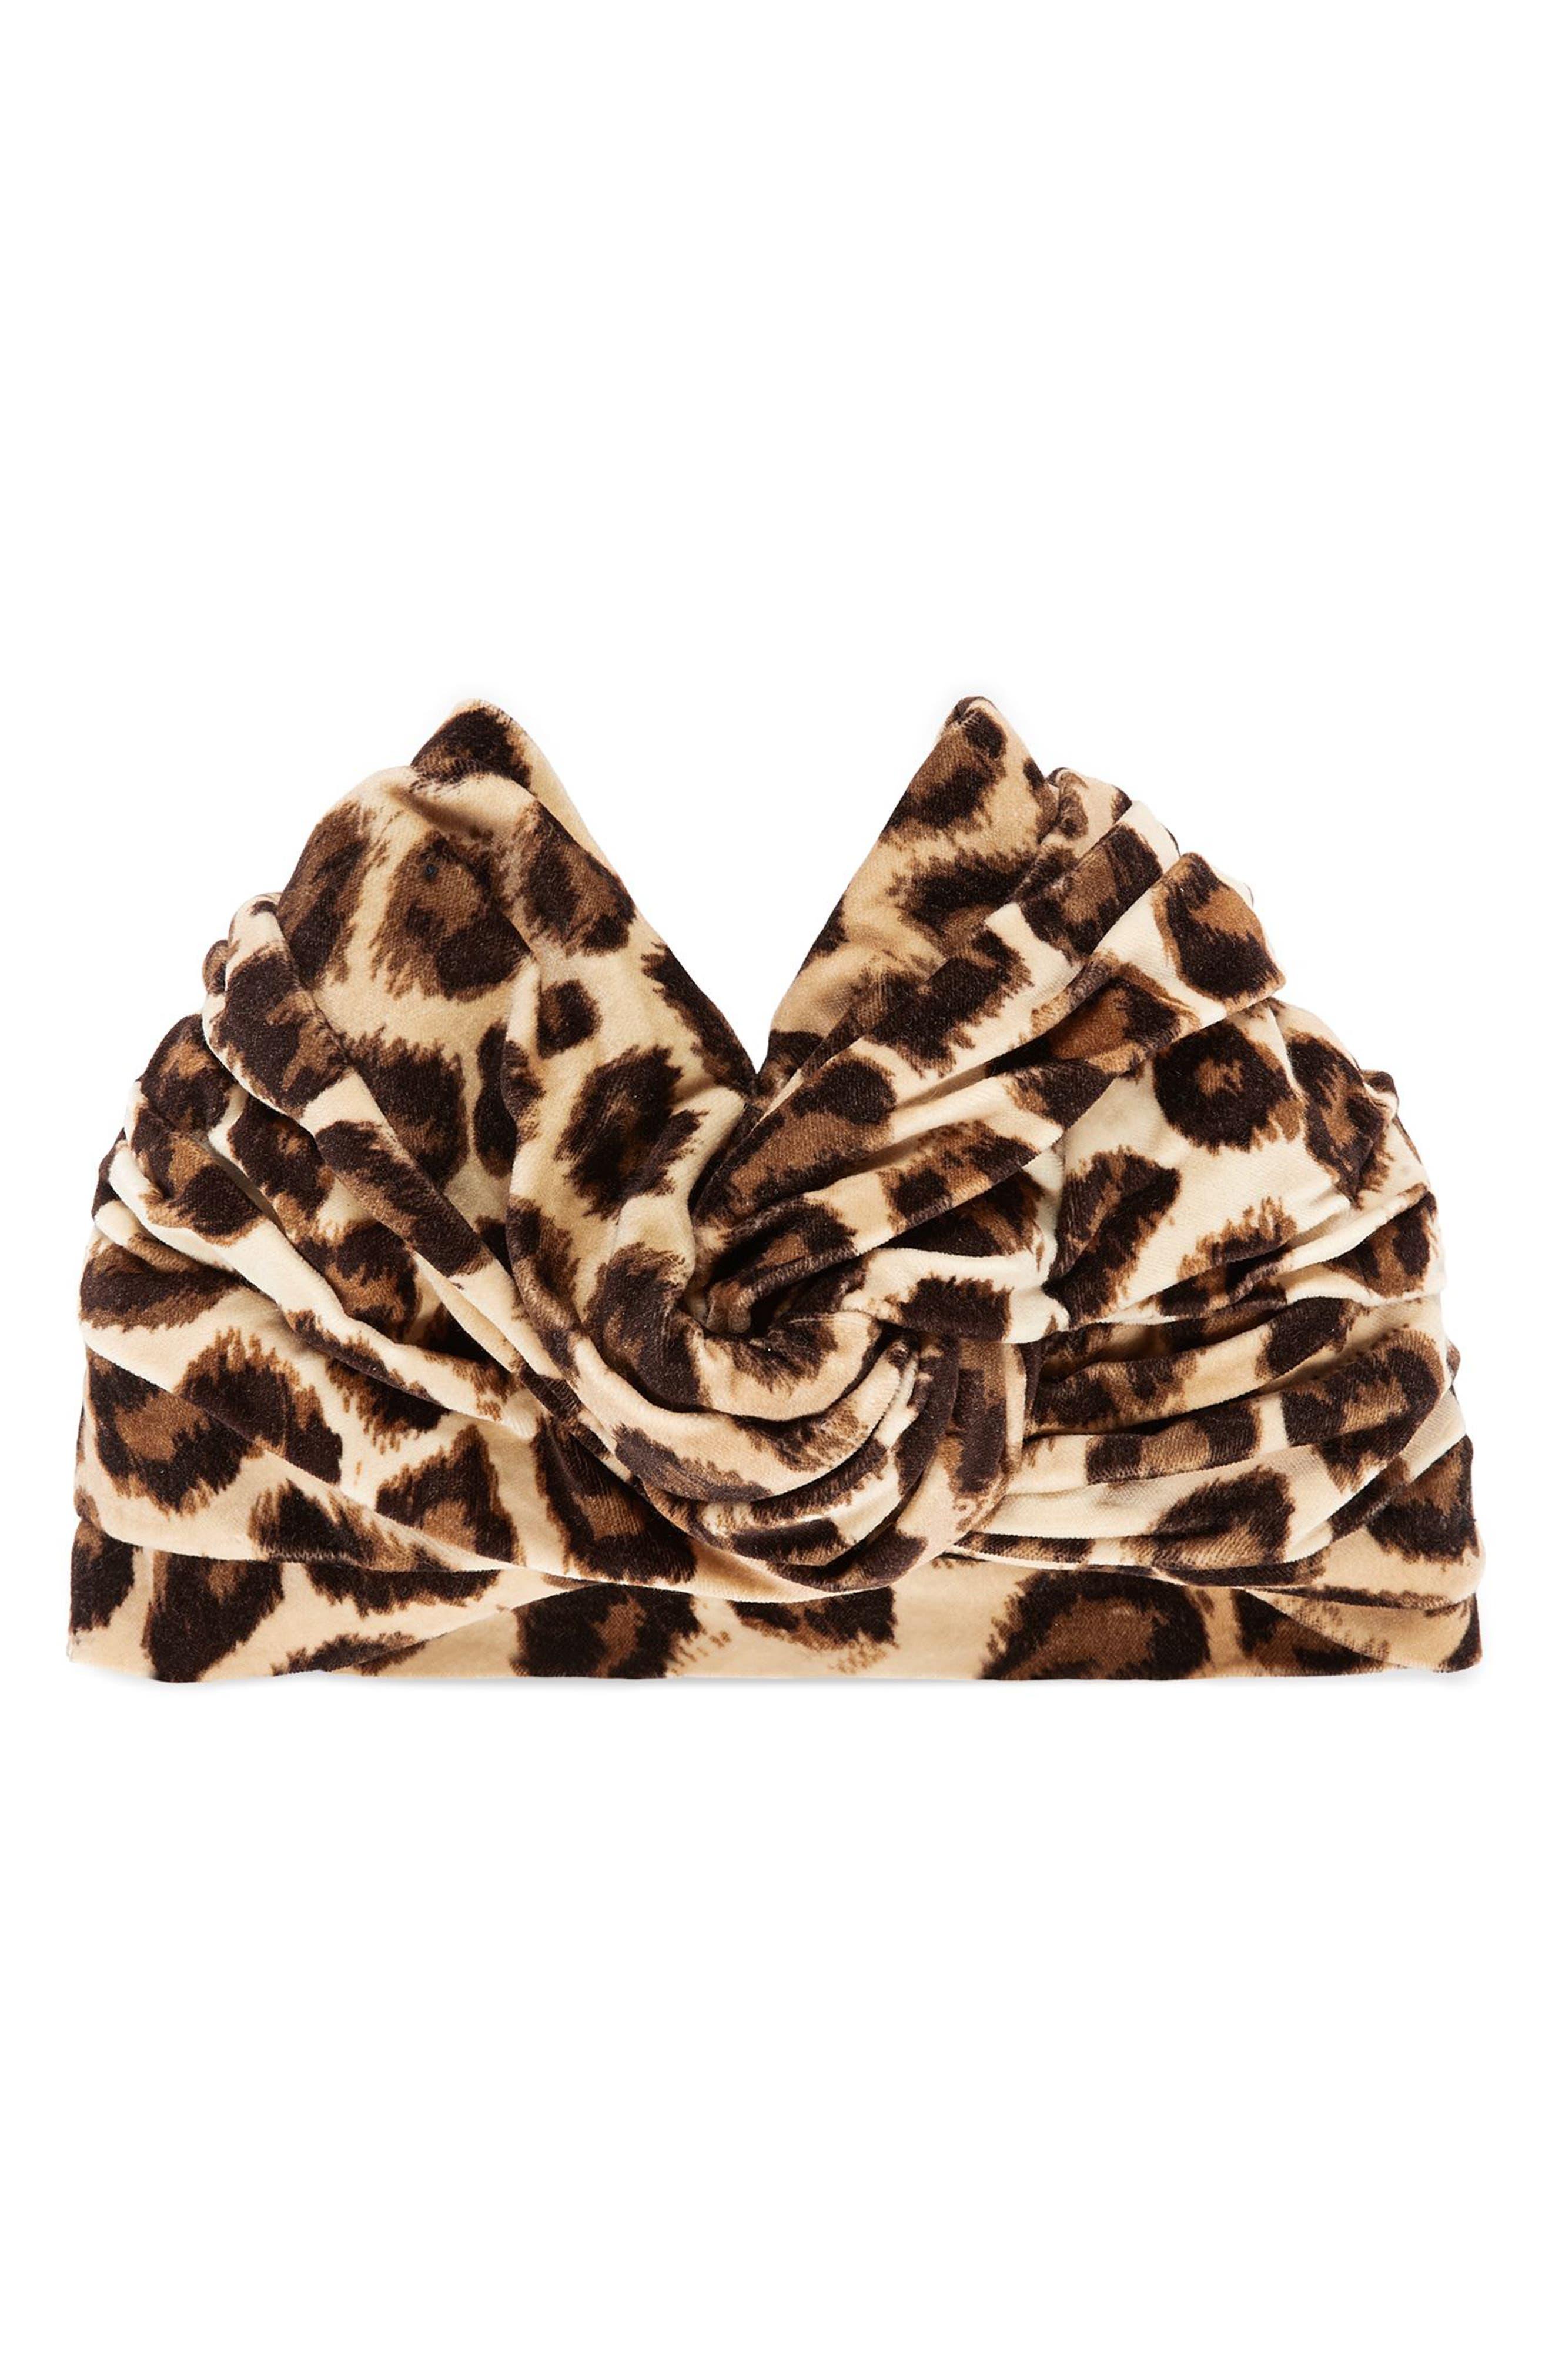 Lucileo Leopard Velvet Turban Headband,                             Main thumbnail 1, color,                             287